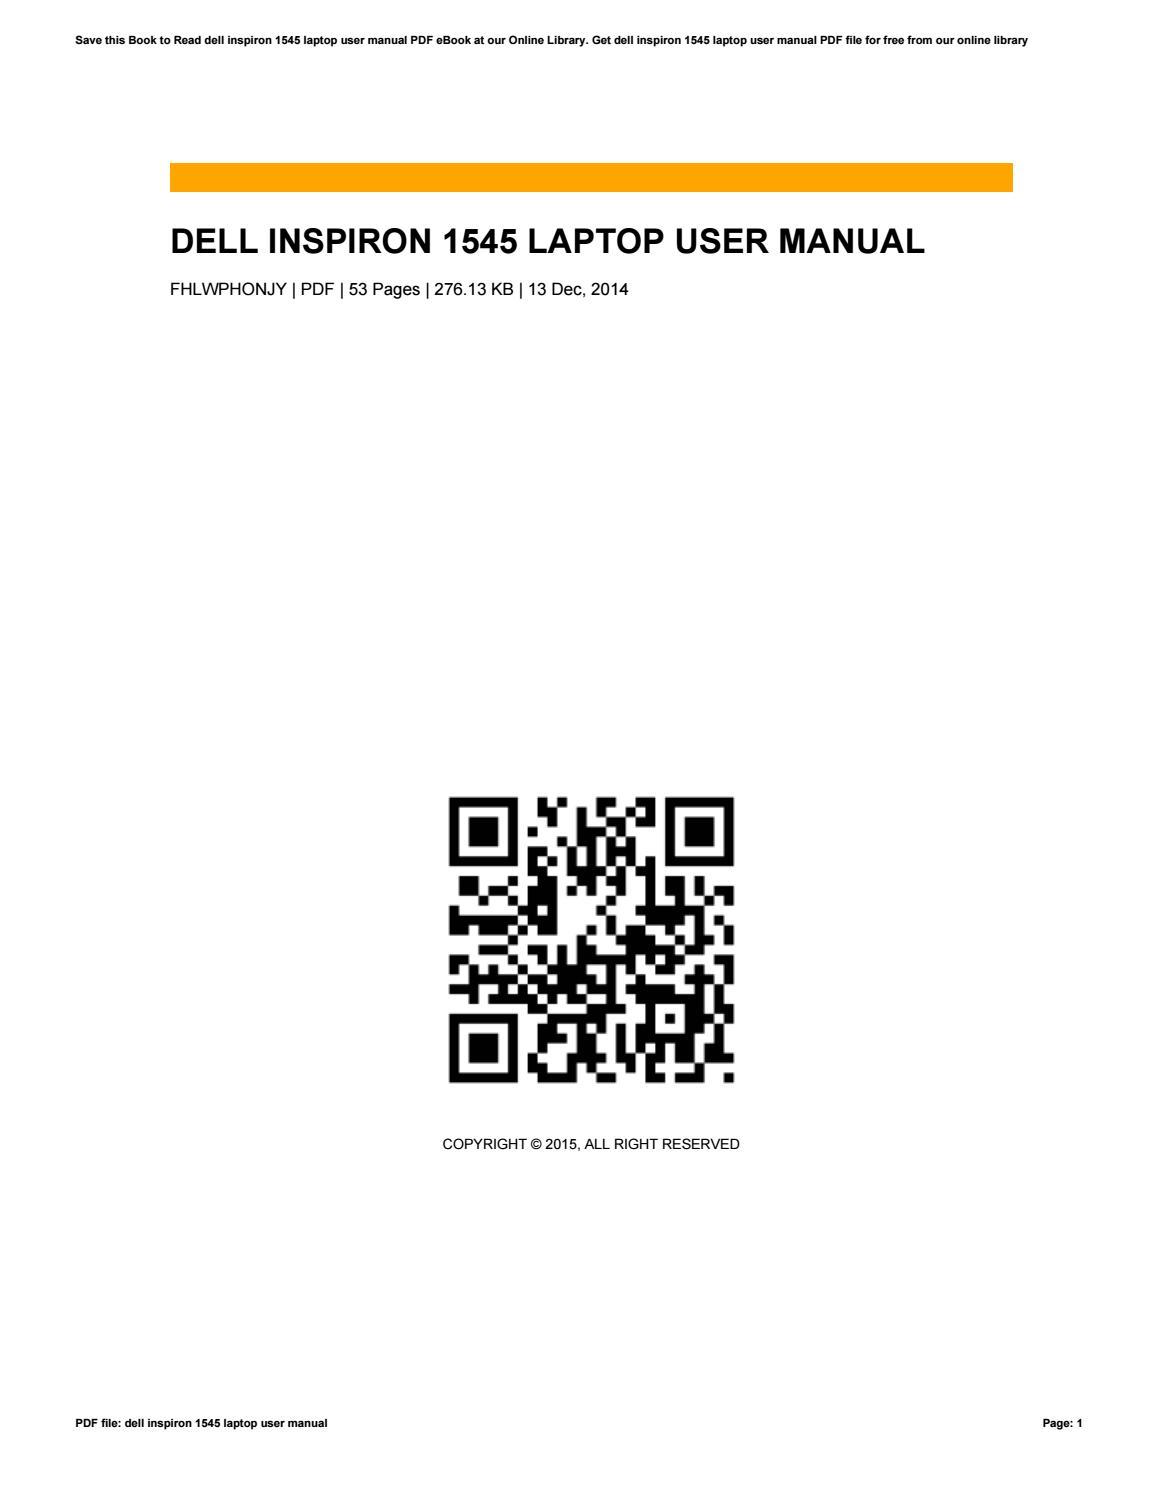 dell manuals laptop ebook rh dell manuals laptop ebook tempower us